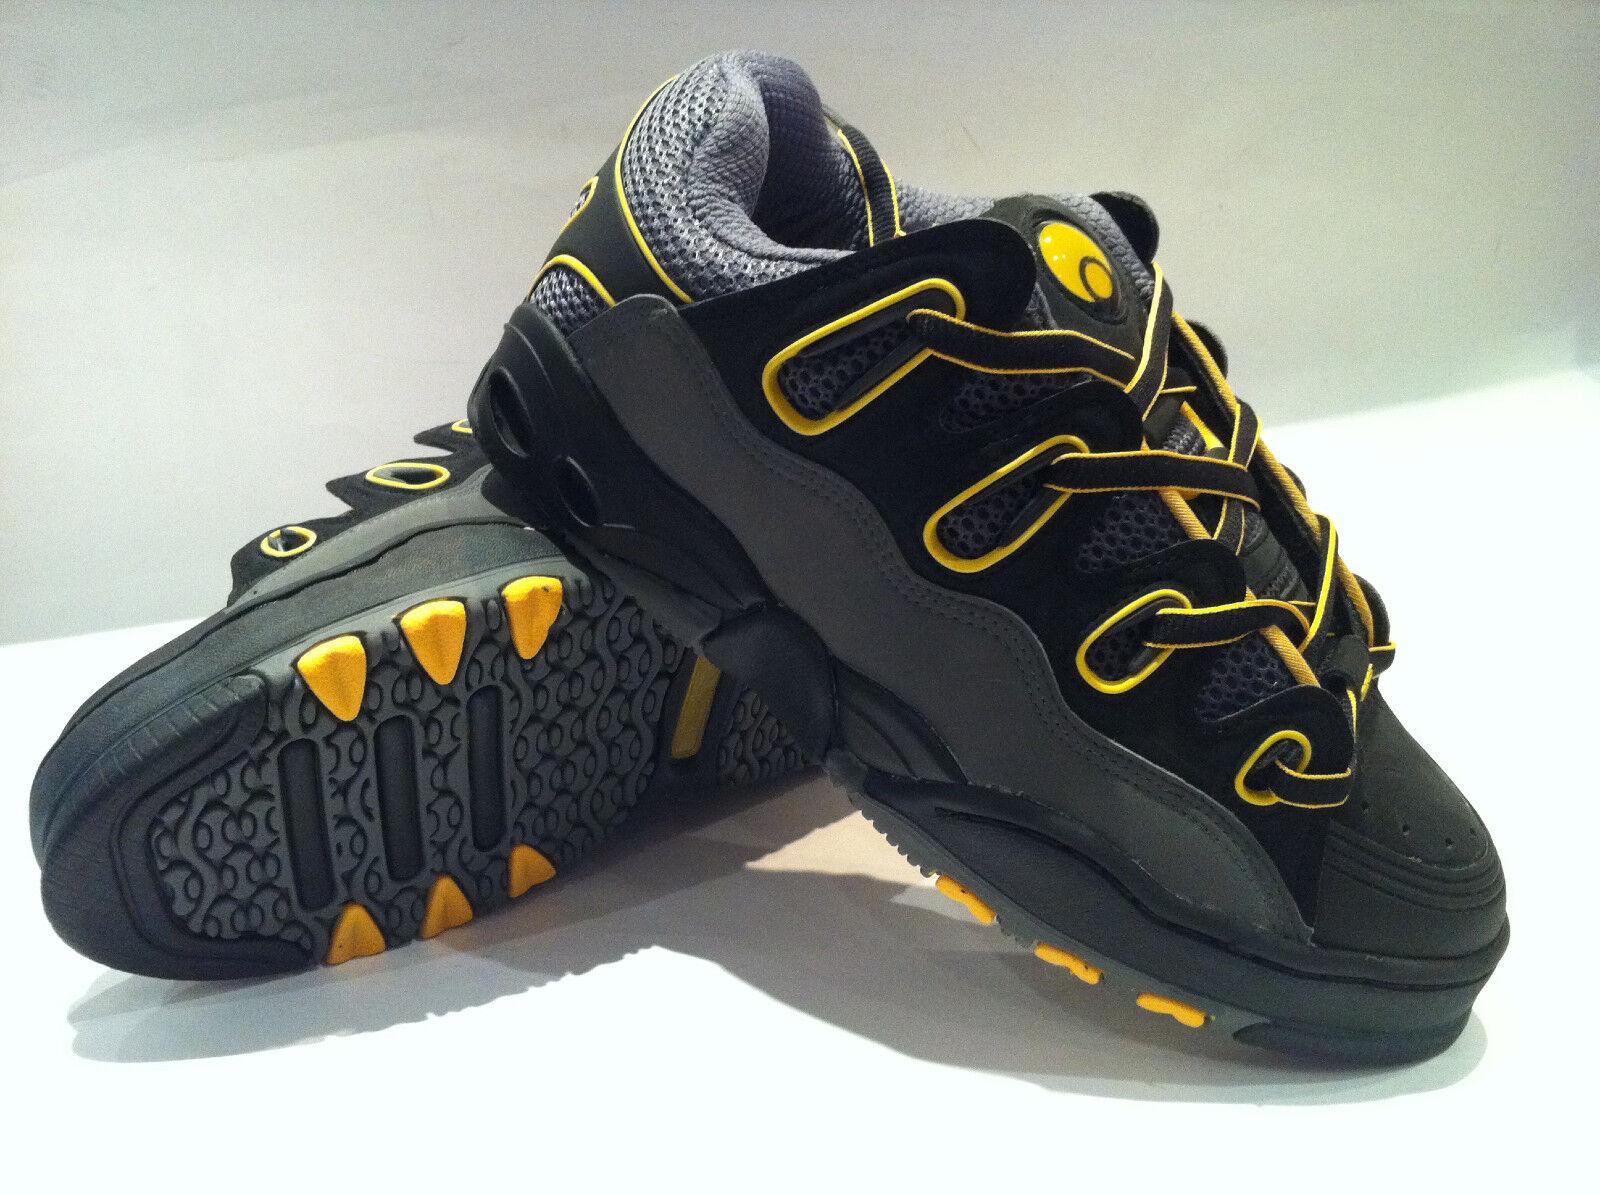 Osiris D3 Dave Mayhew Vintage shoes, 6 colors, size US3,5,6,7,9,9.5 KOSTON,CHET